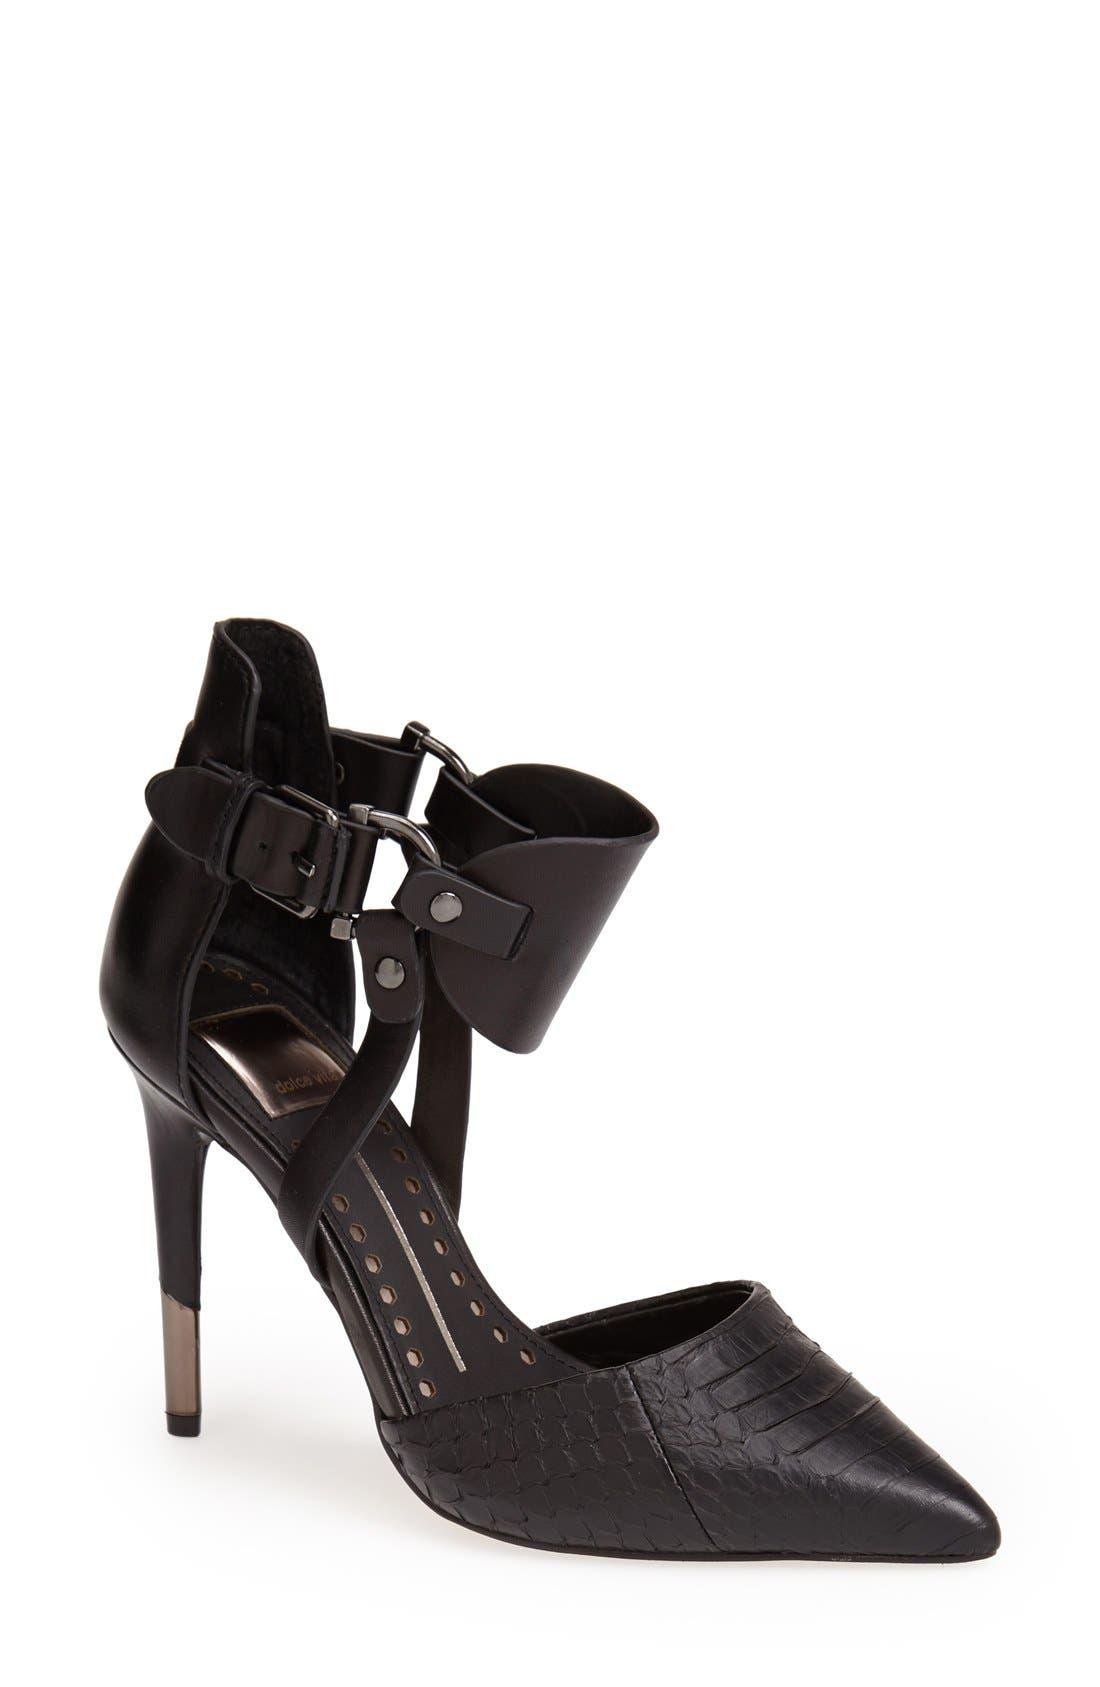 Main Image - Dolce Vita 'Knoxx' Leather Pump (Women)